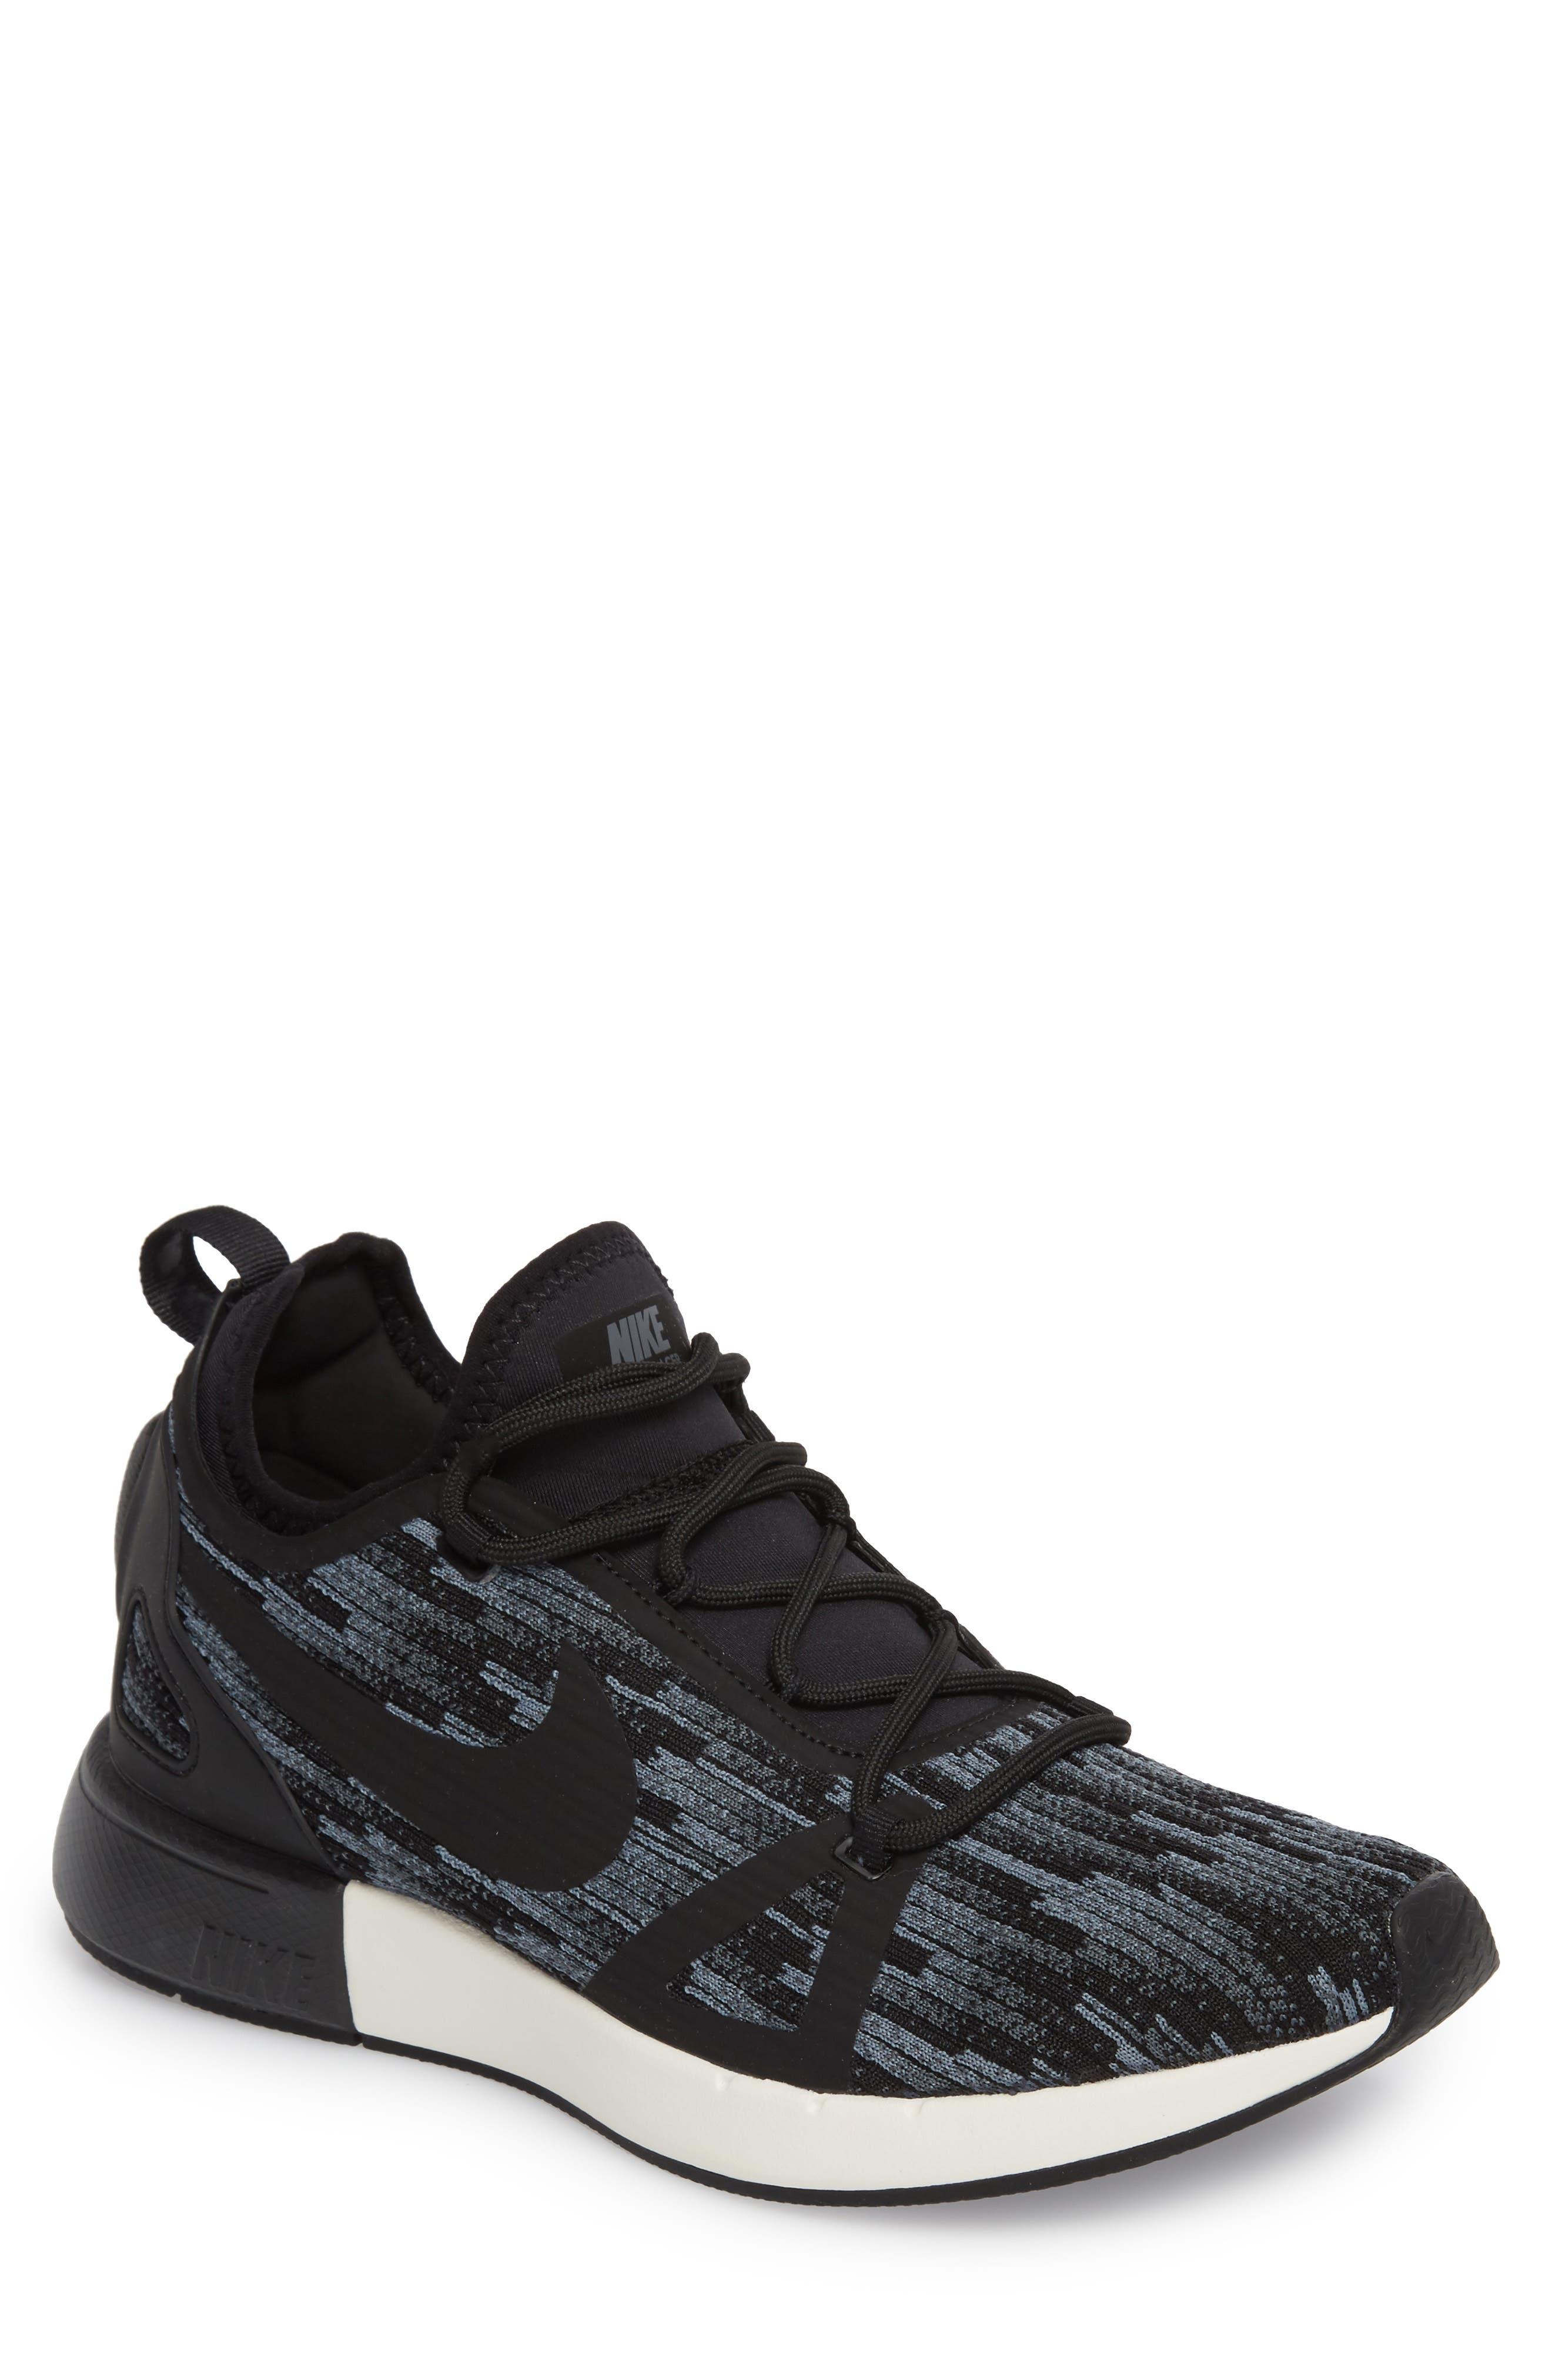 Duel Racer SE Knit Sneaker,                         Main,                         color, 020